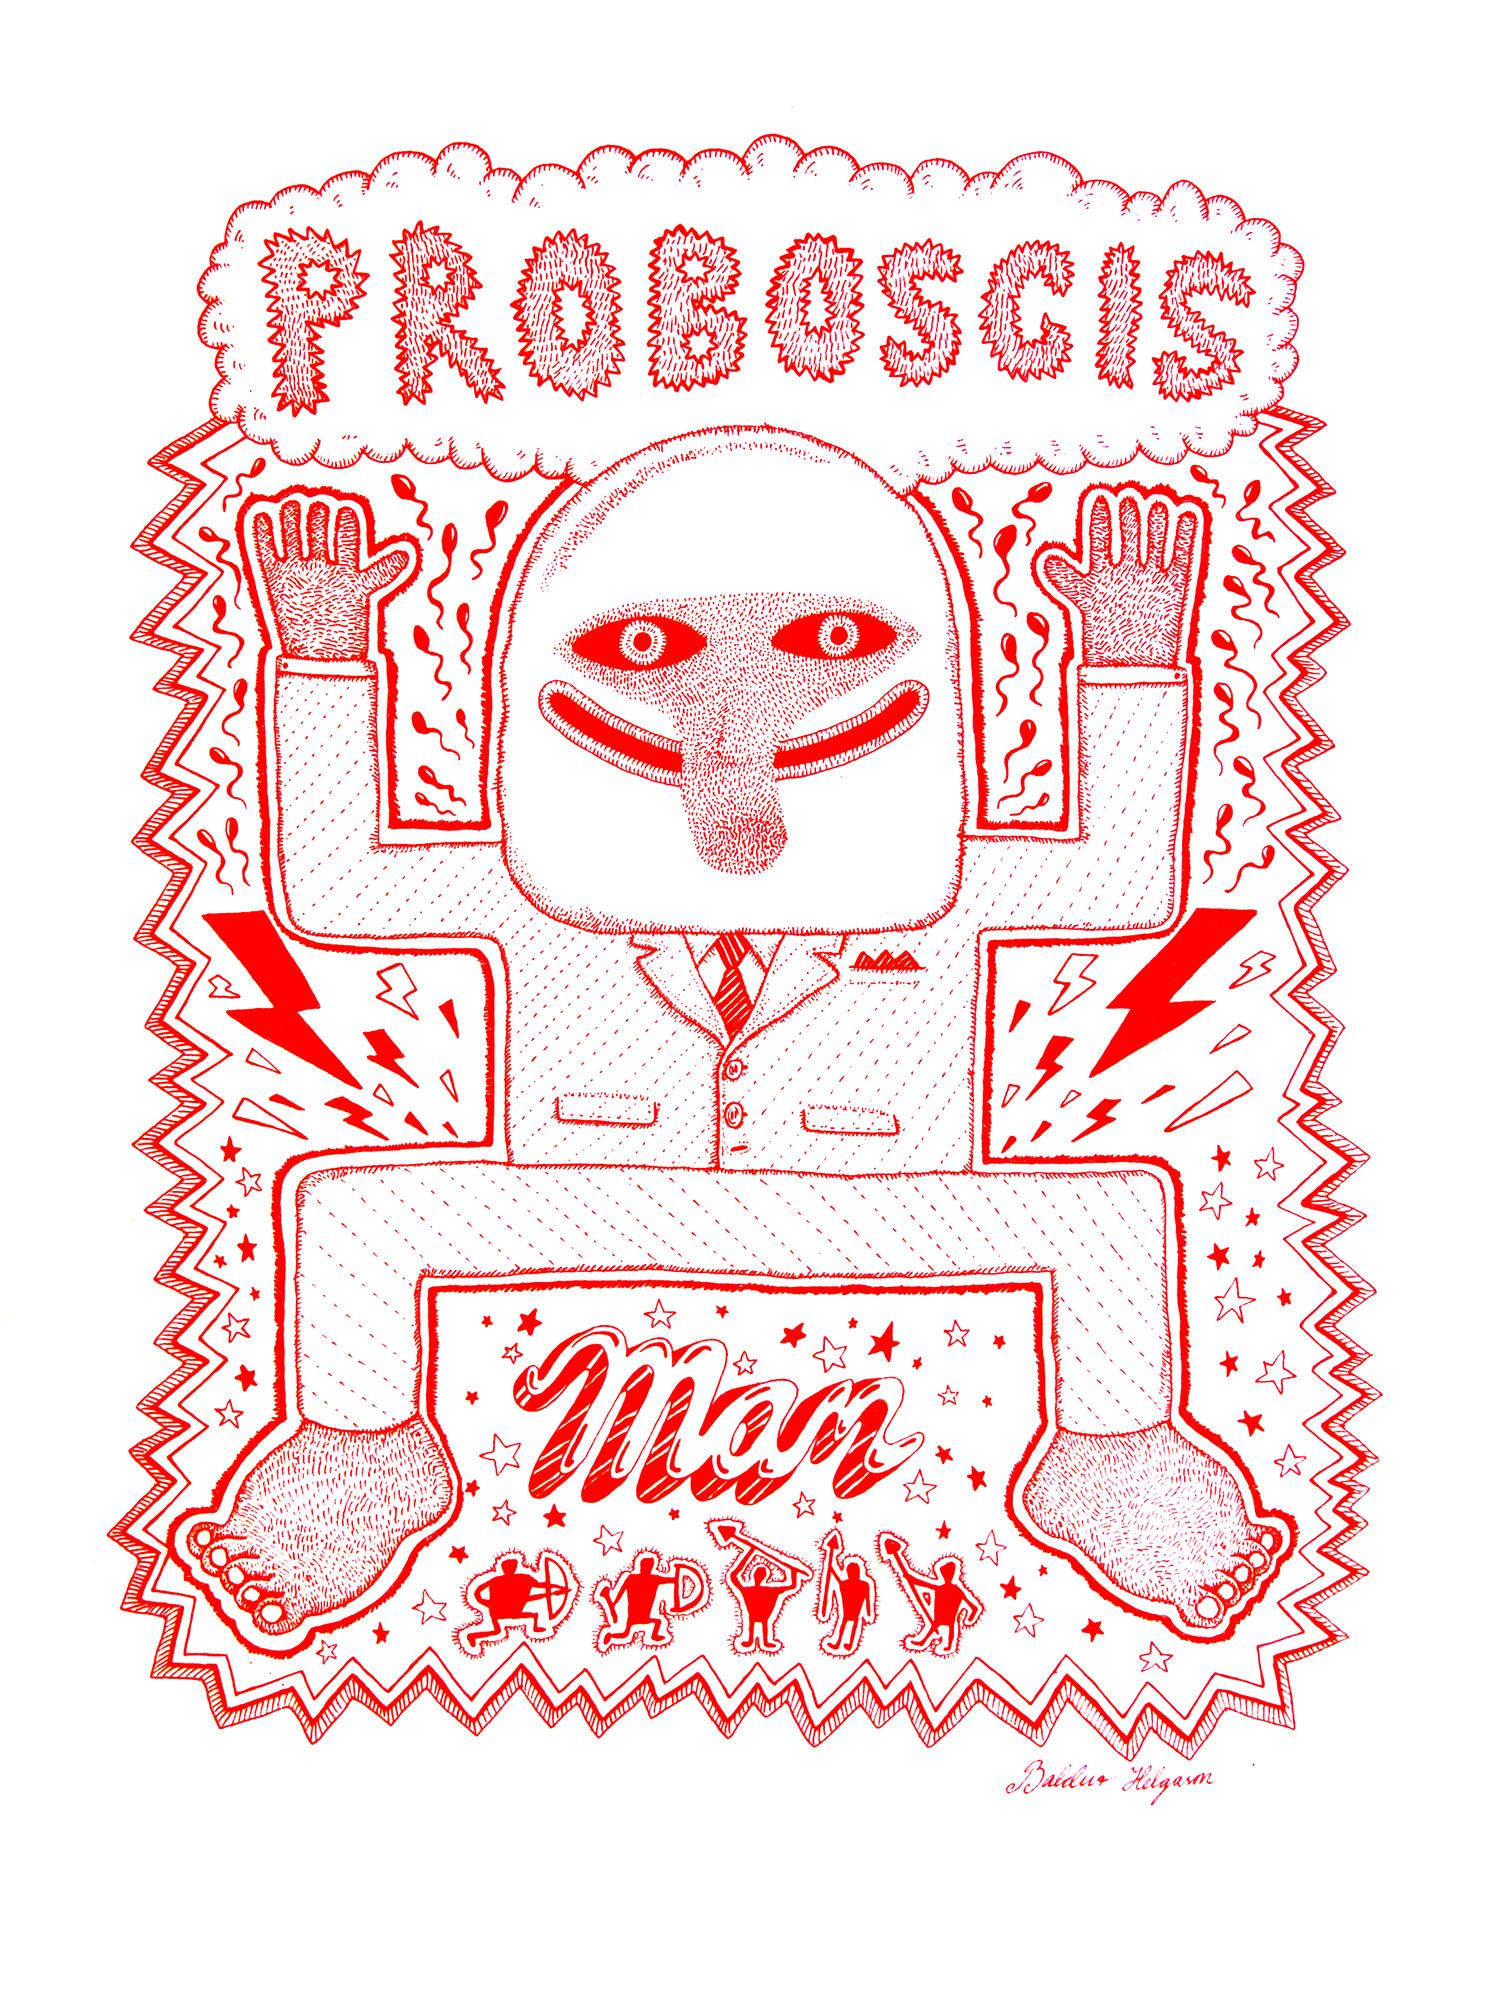 PROBOSCIS MAN